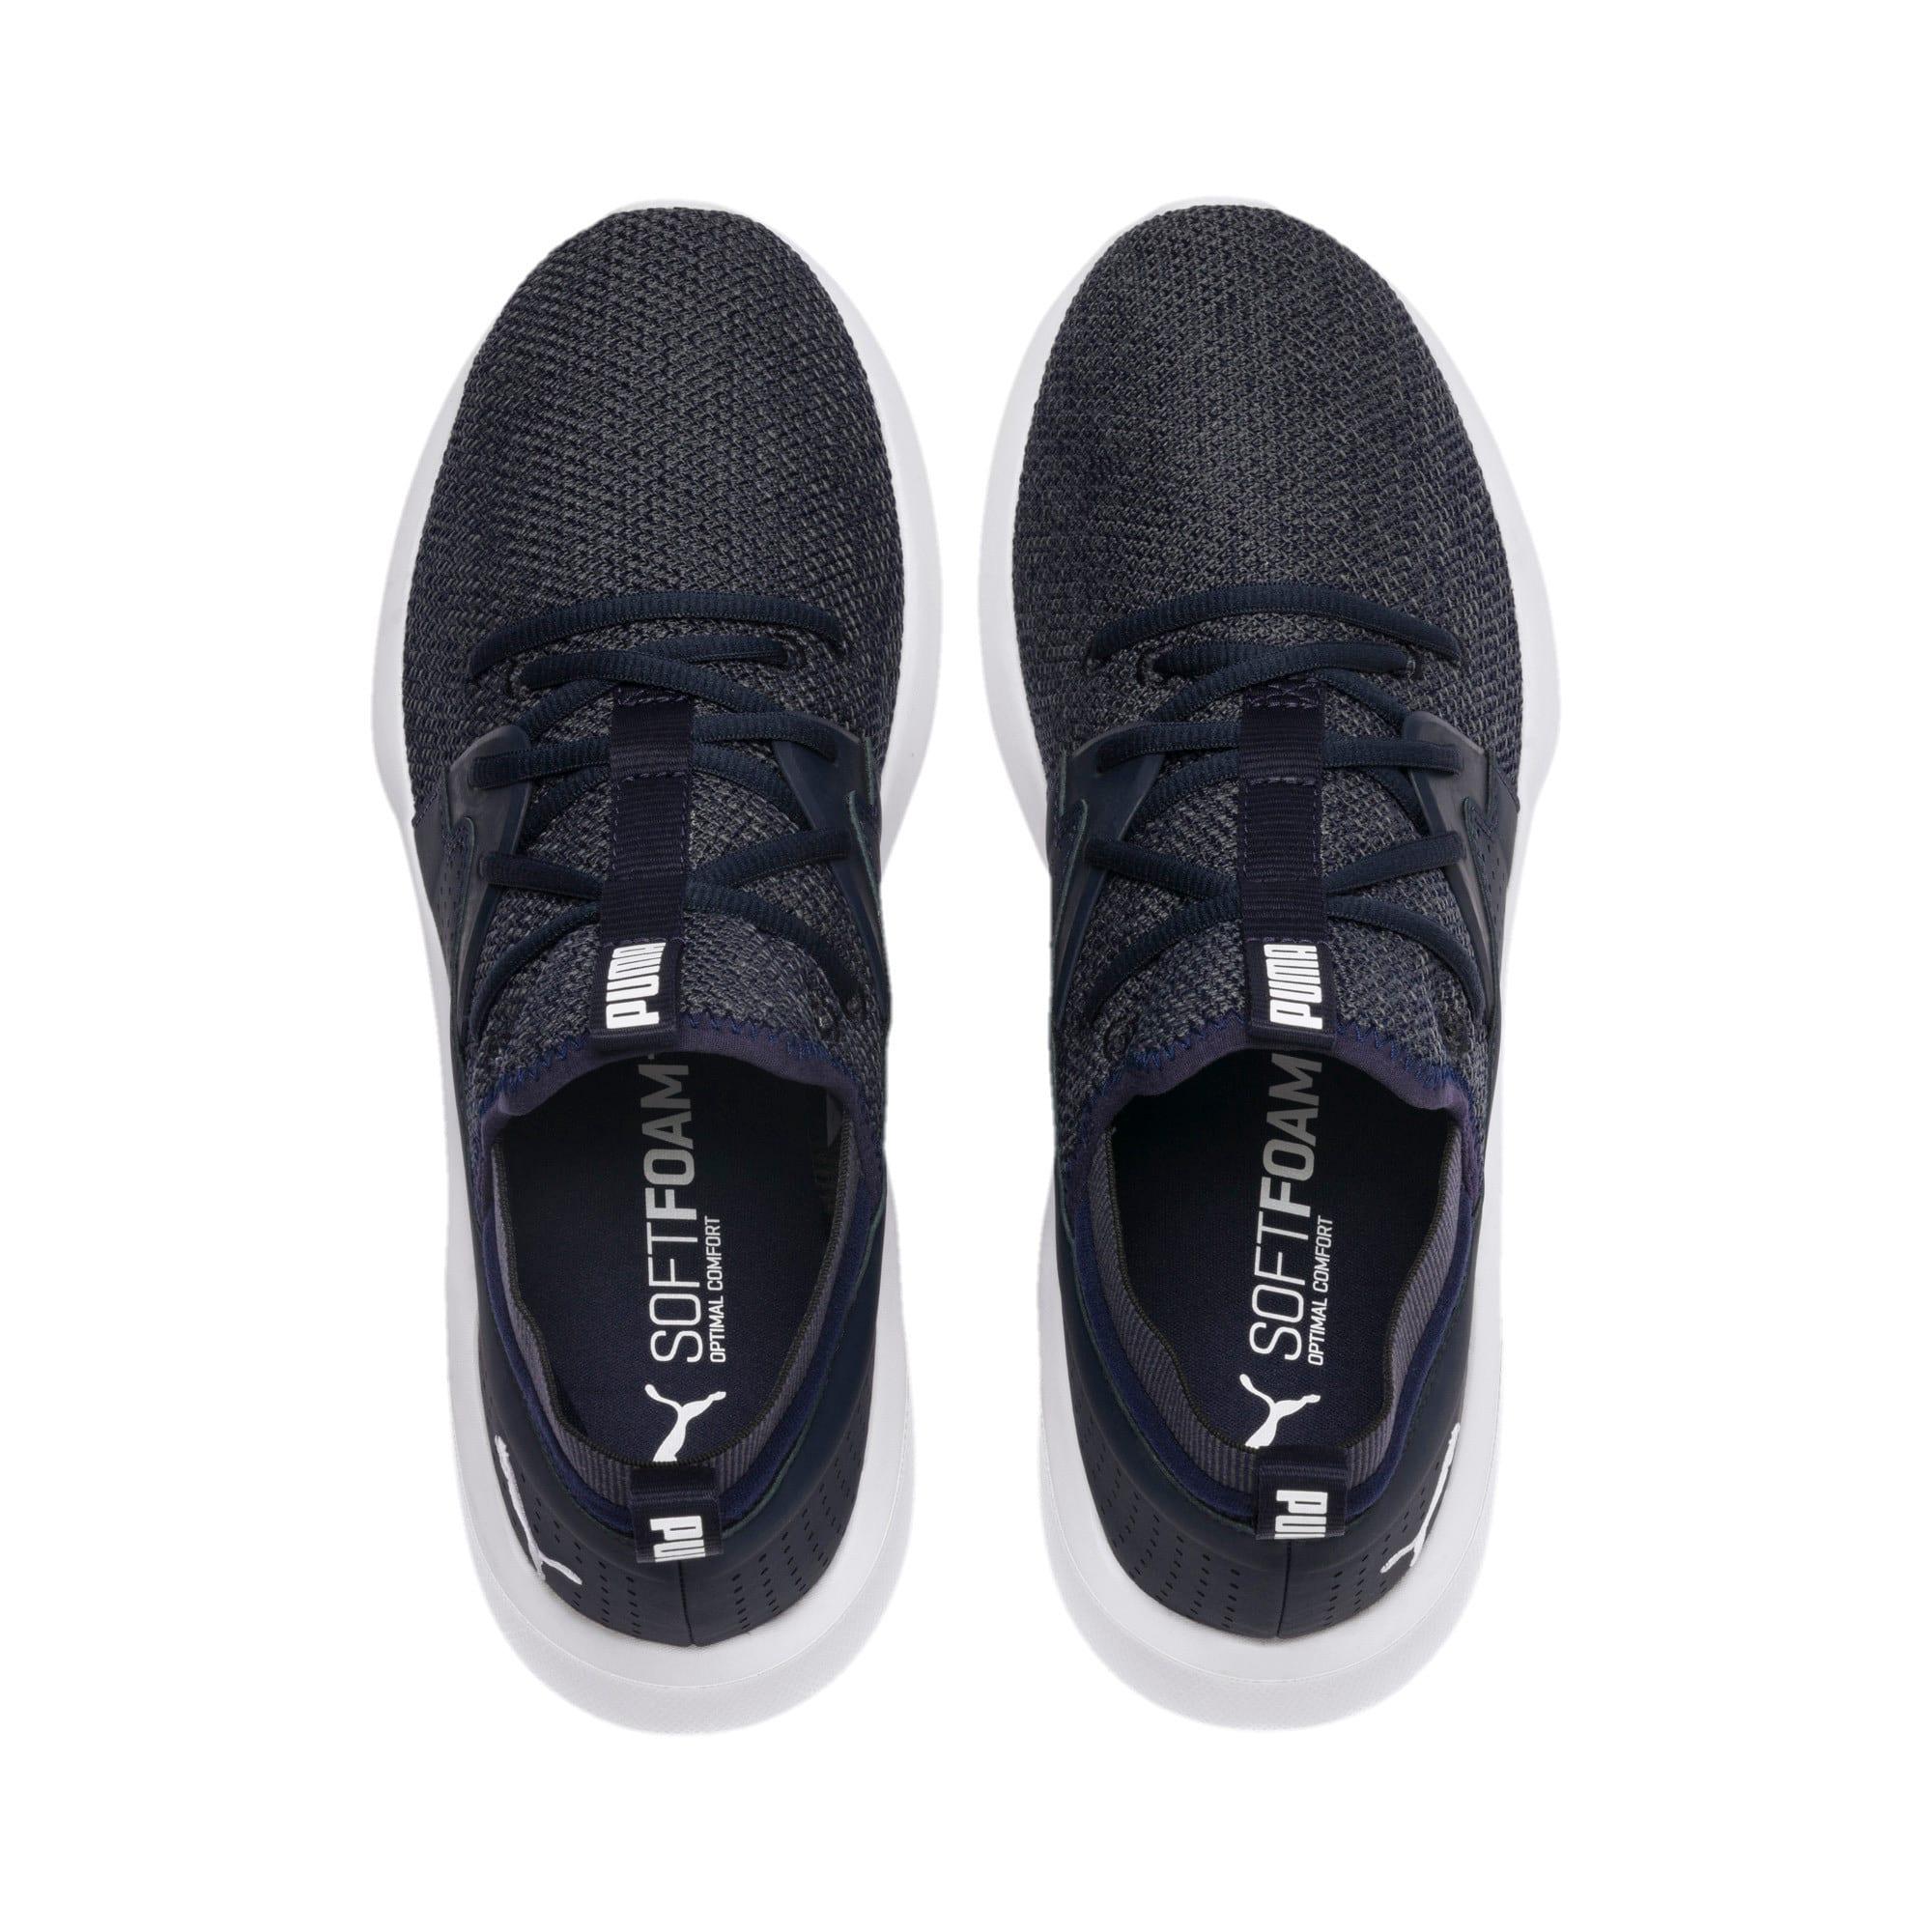 Thumbnail 6 of Emergence Men's Running Shoes, High Risk Red-Puma Black, medium-IND